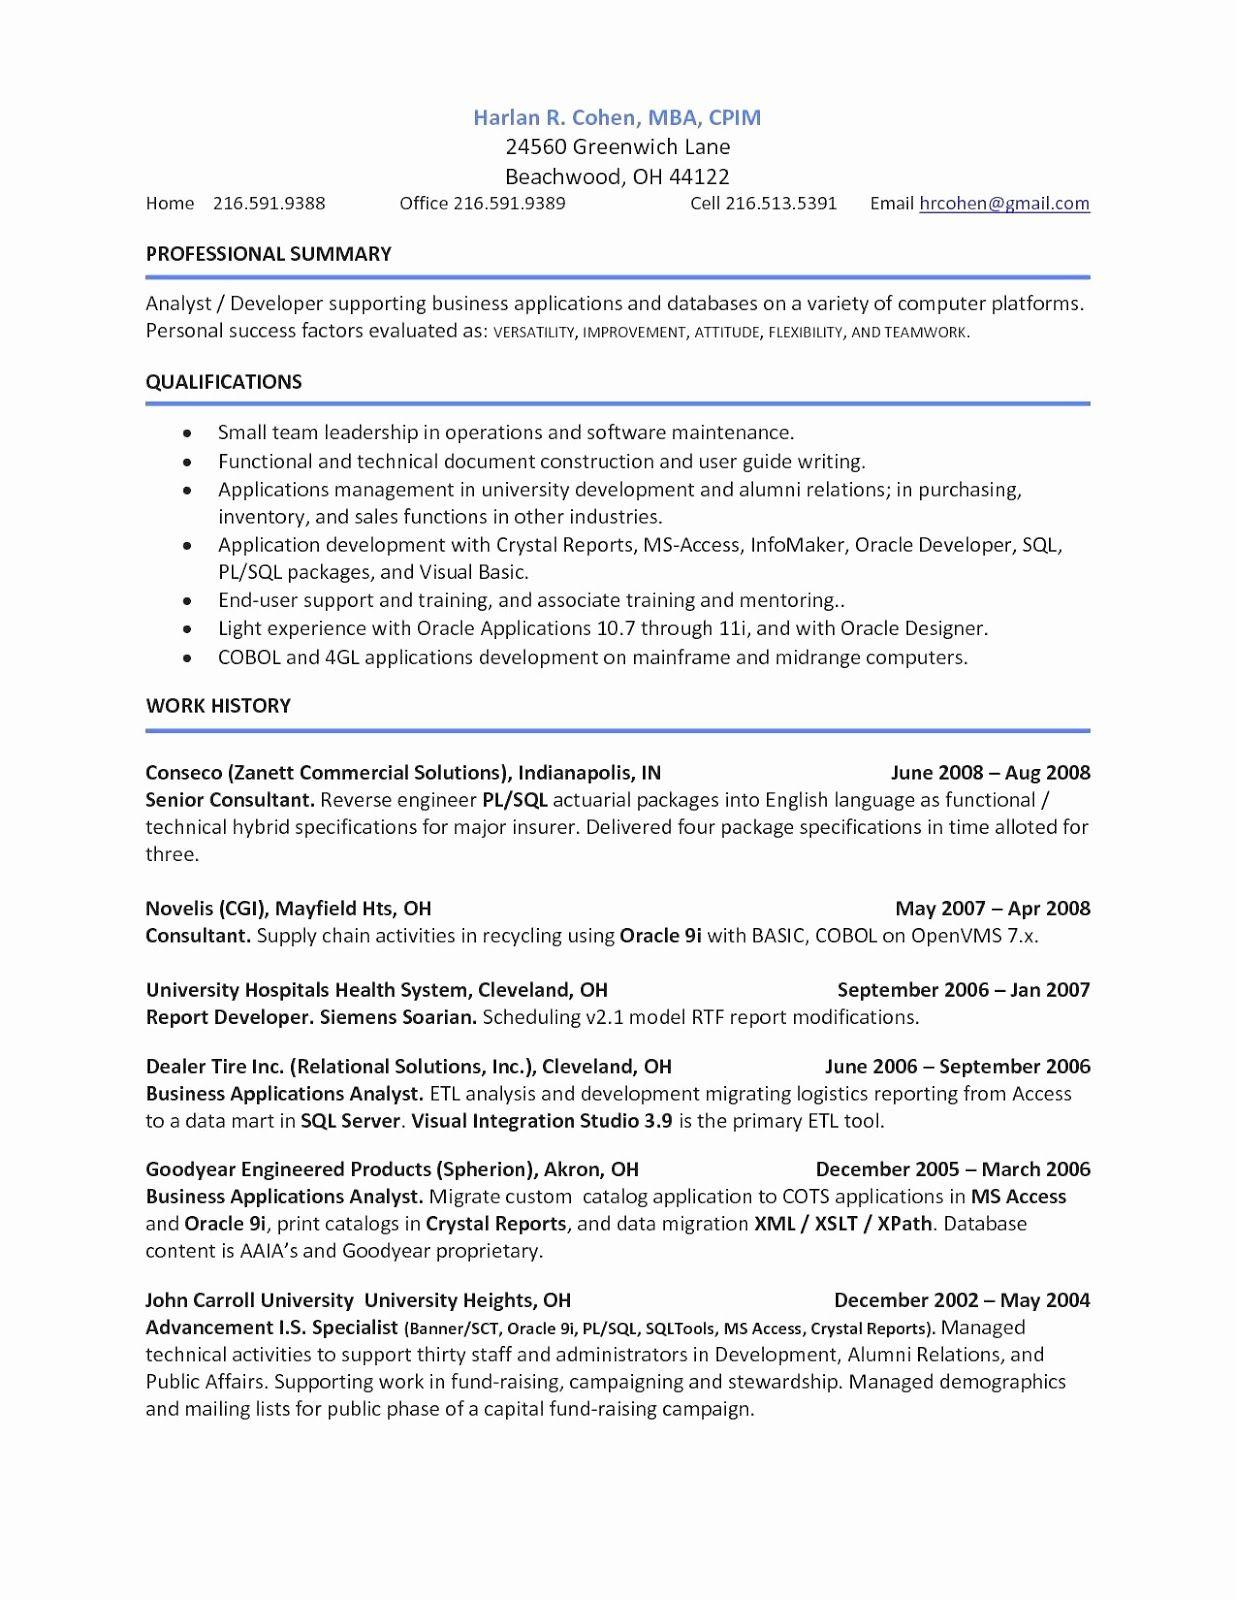 Account Clerk Resume Account Clerk Resume Sample Account Clerk Resume Examples Account Clerk Resume Cover Job Resume Examples Resume Examples Resume Skills